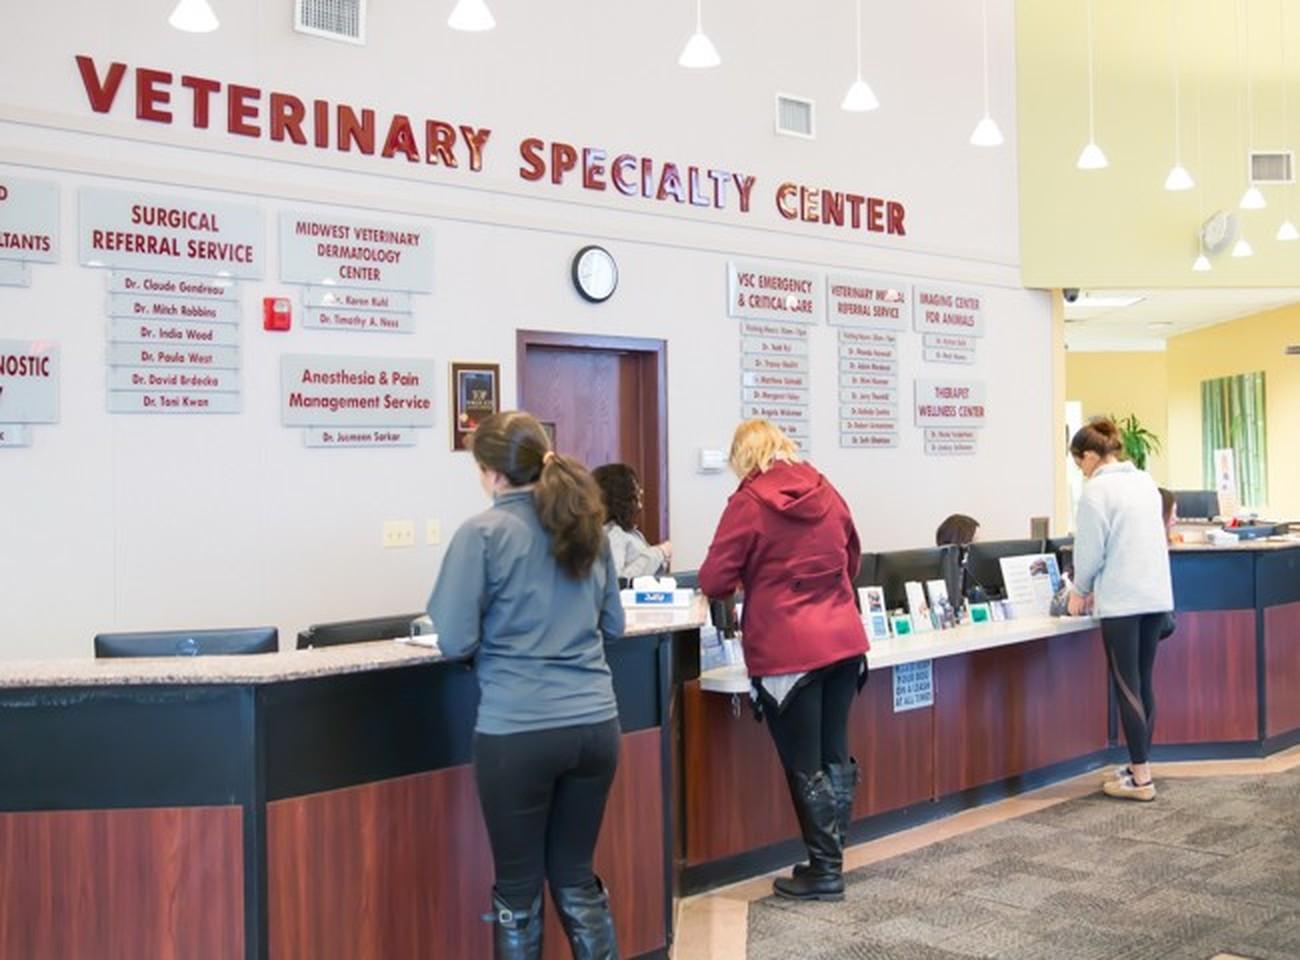 Veterinary Specialty Center Careers